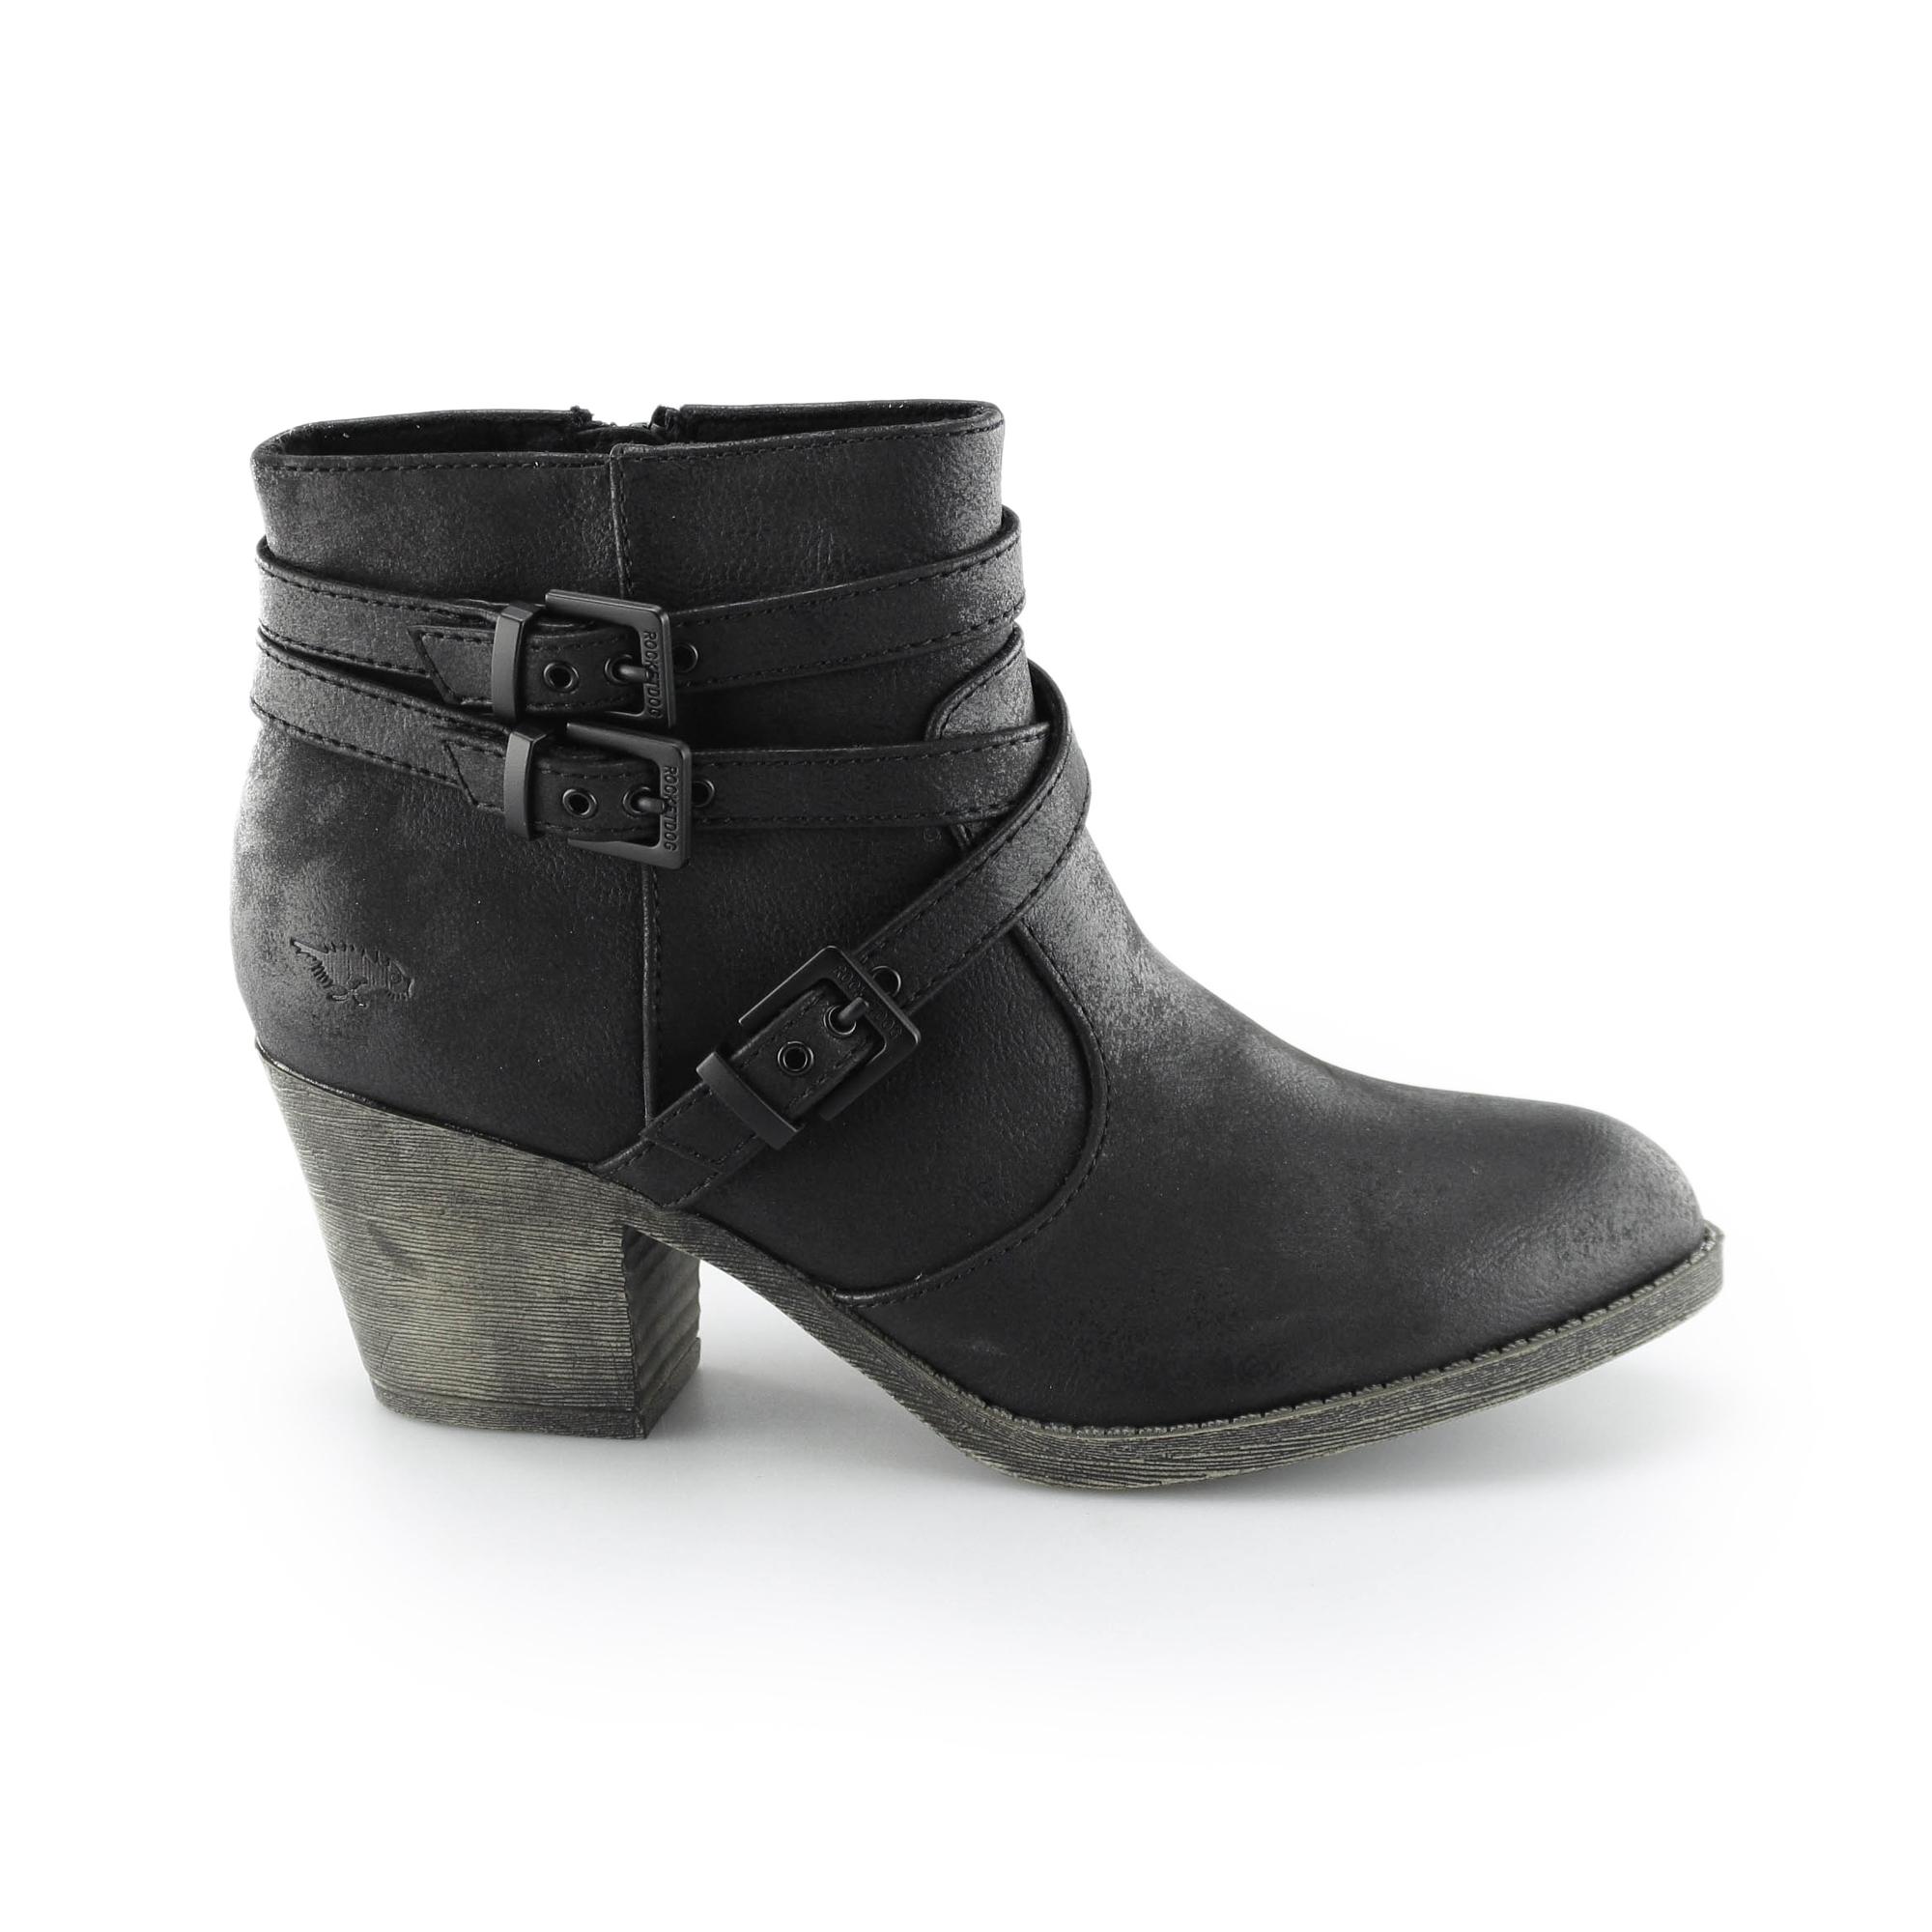 ba14e9652 Rocket Dog SEON Ladies High Block Heel Ankle Boots Black |Shuperb